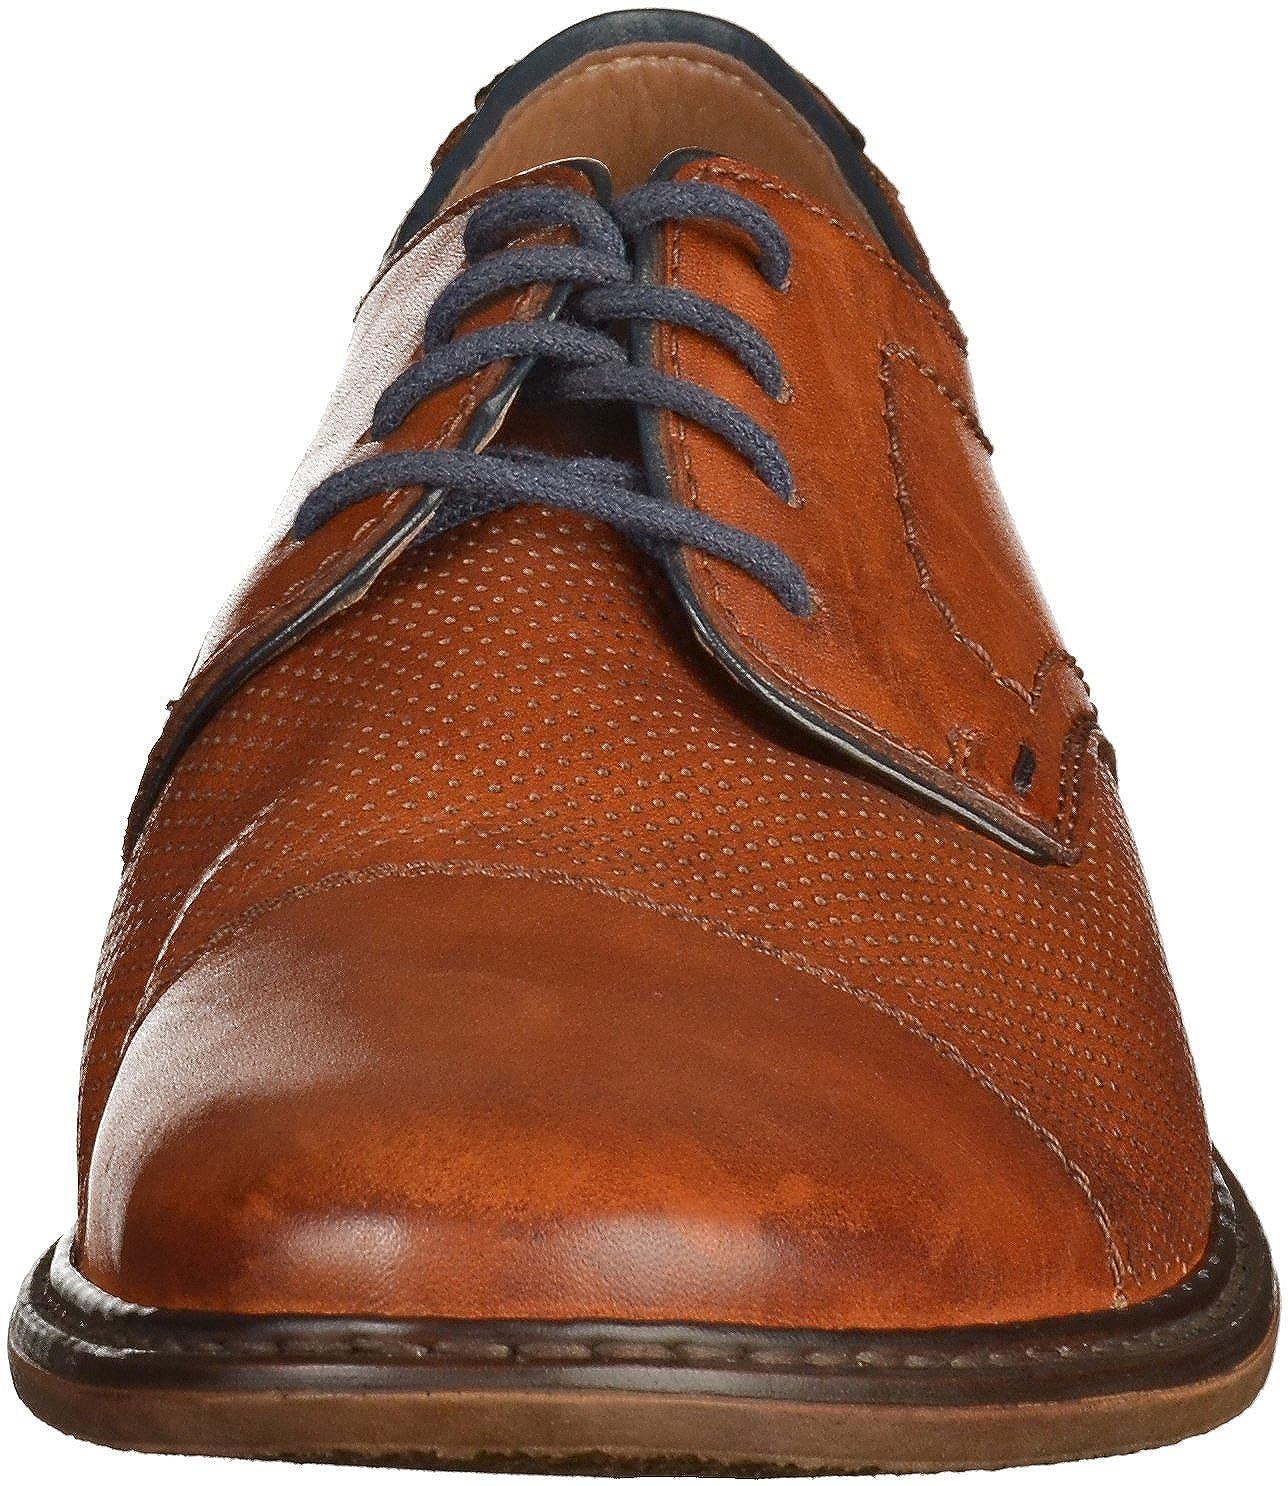 Rieker Rieker Rieker 13428-24 Obermaterial Leder, Zapatos de Cordones Derby para Hombre 37d638